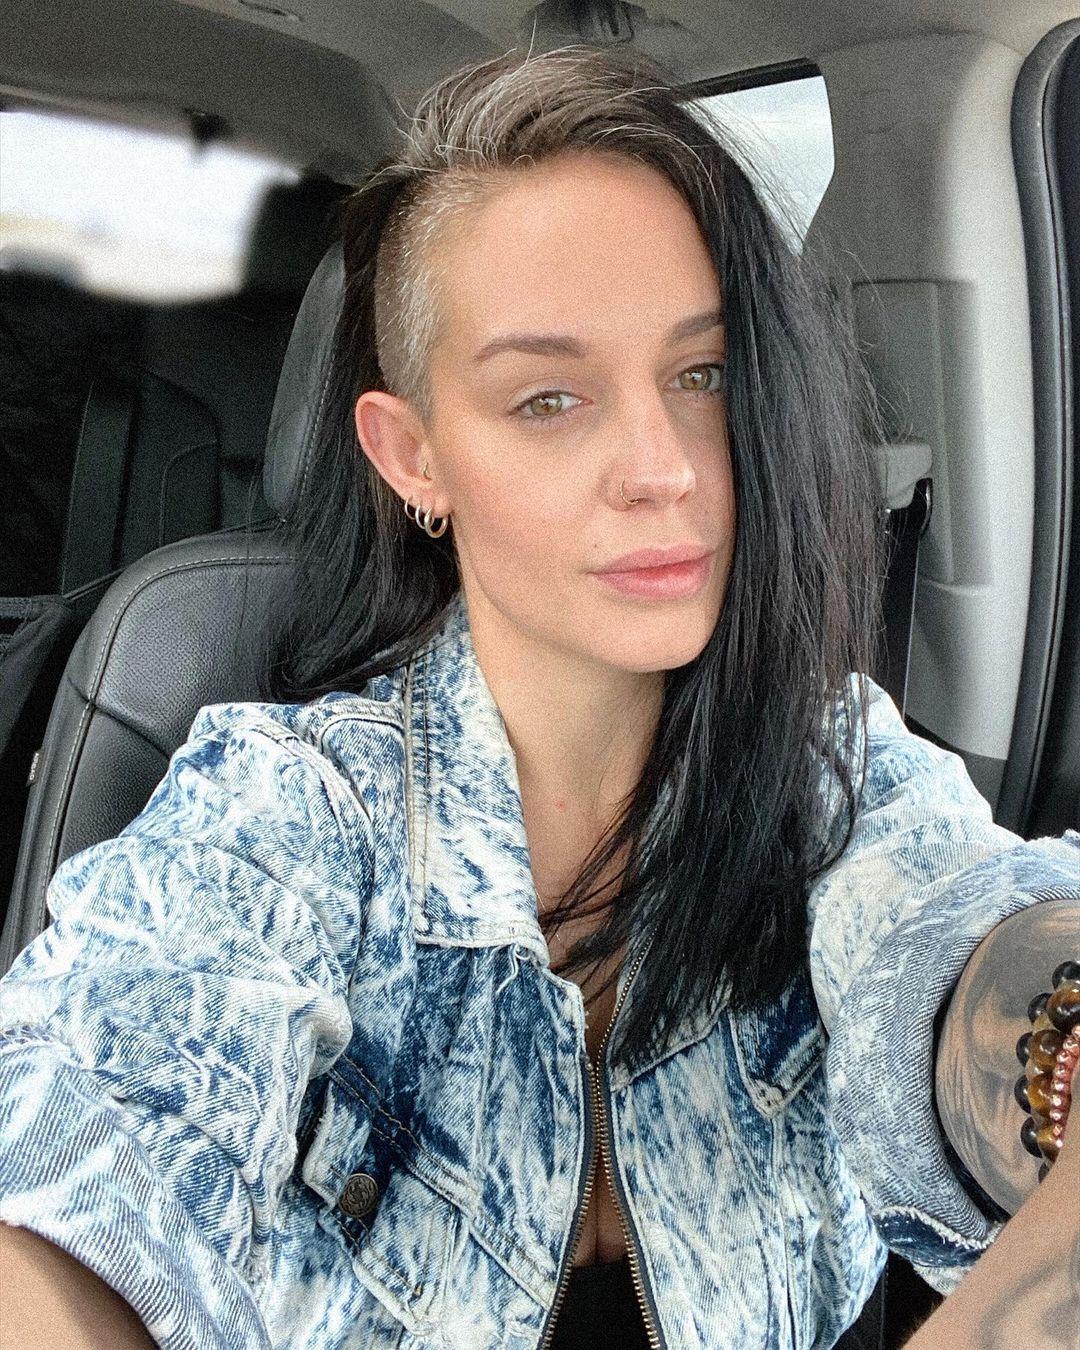 Celeste Bonin Nude Leaked The Fappening & Sexy 0047